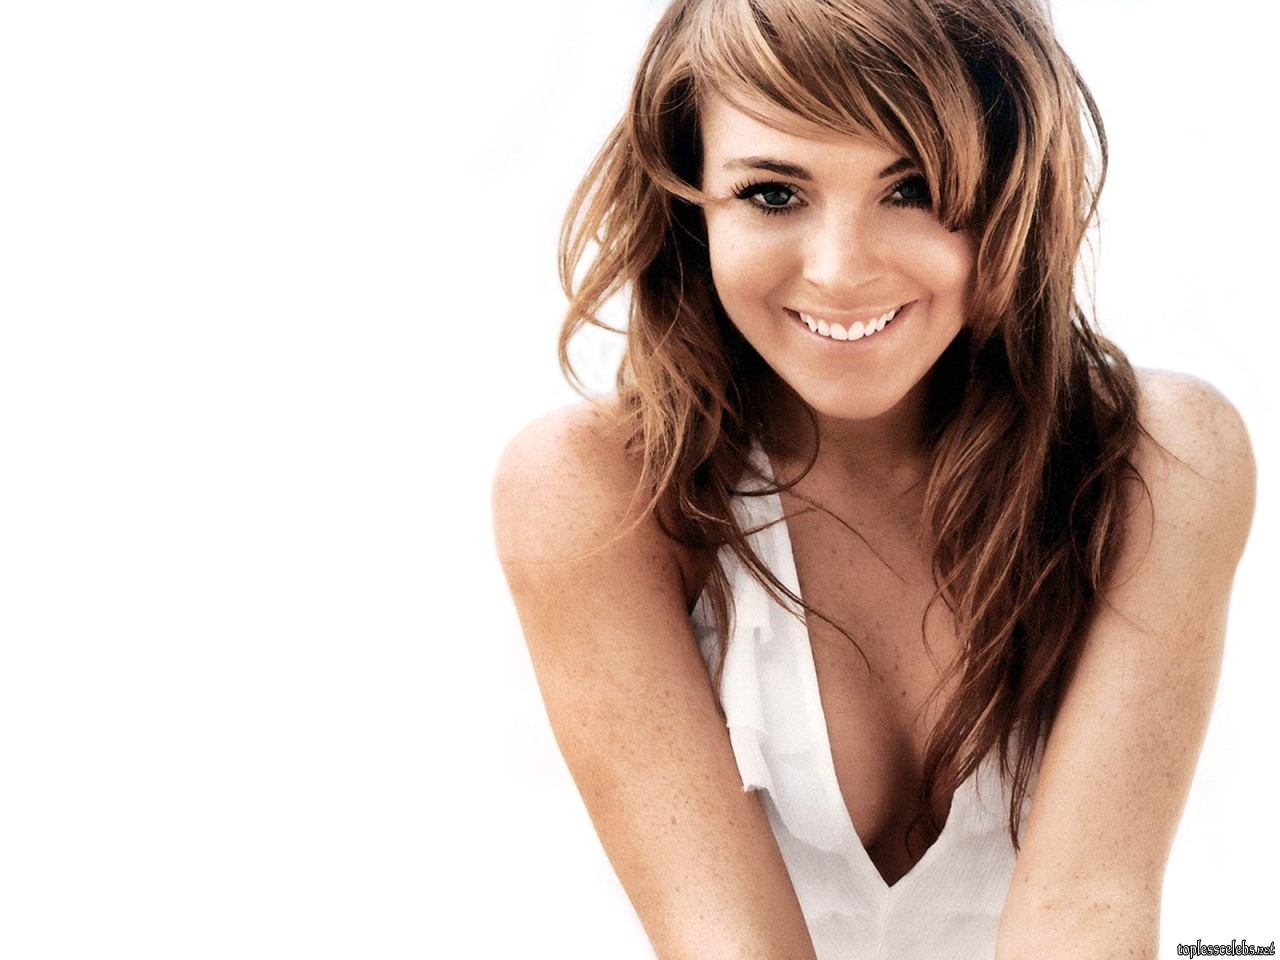 Lindsay Lohan Photos | Hot Famous Celebrities Lindsay Lohan